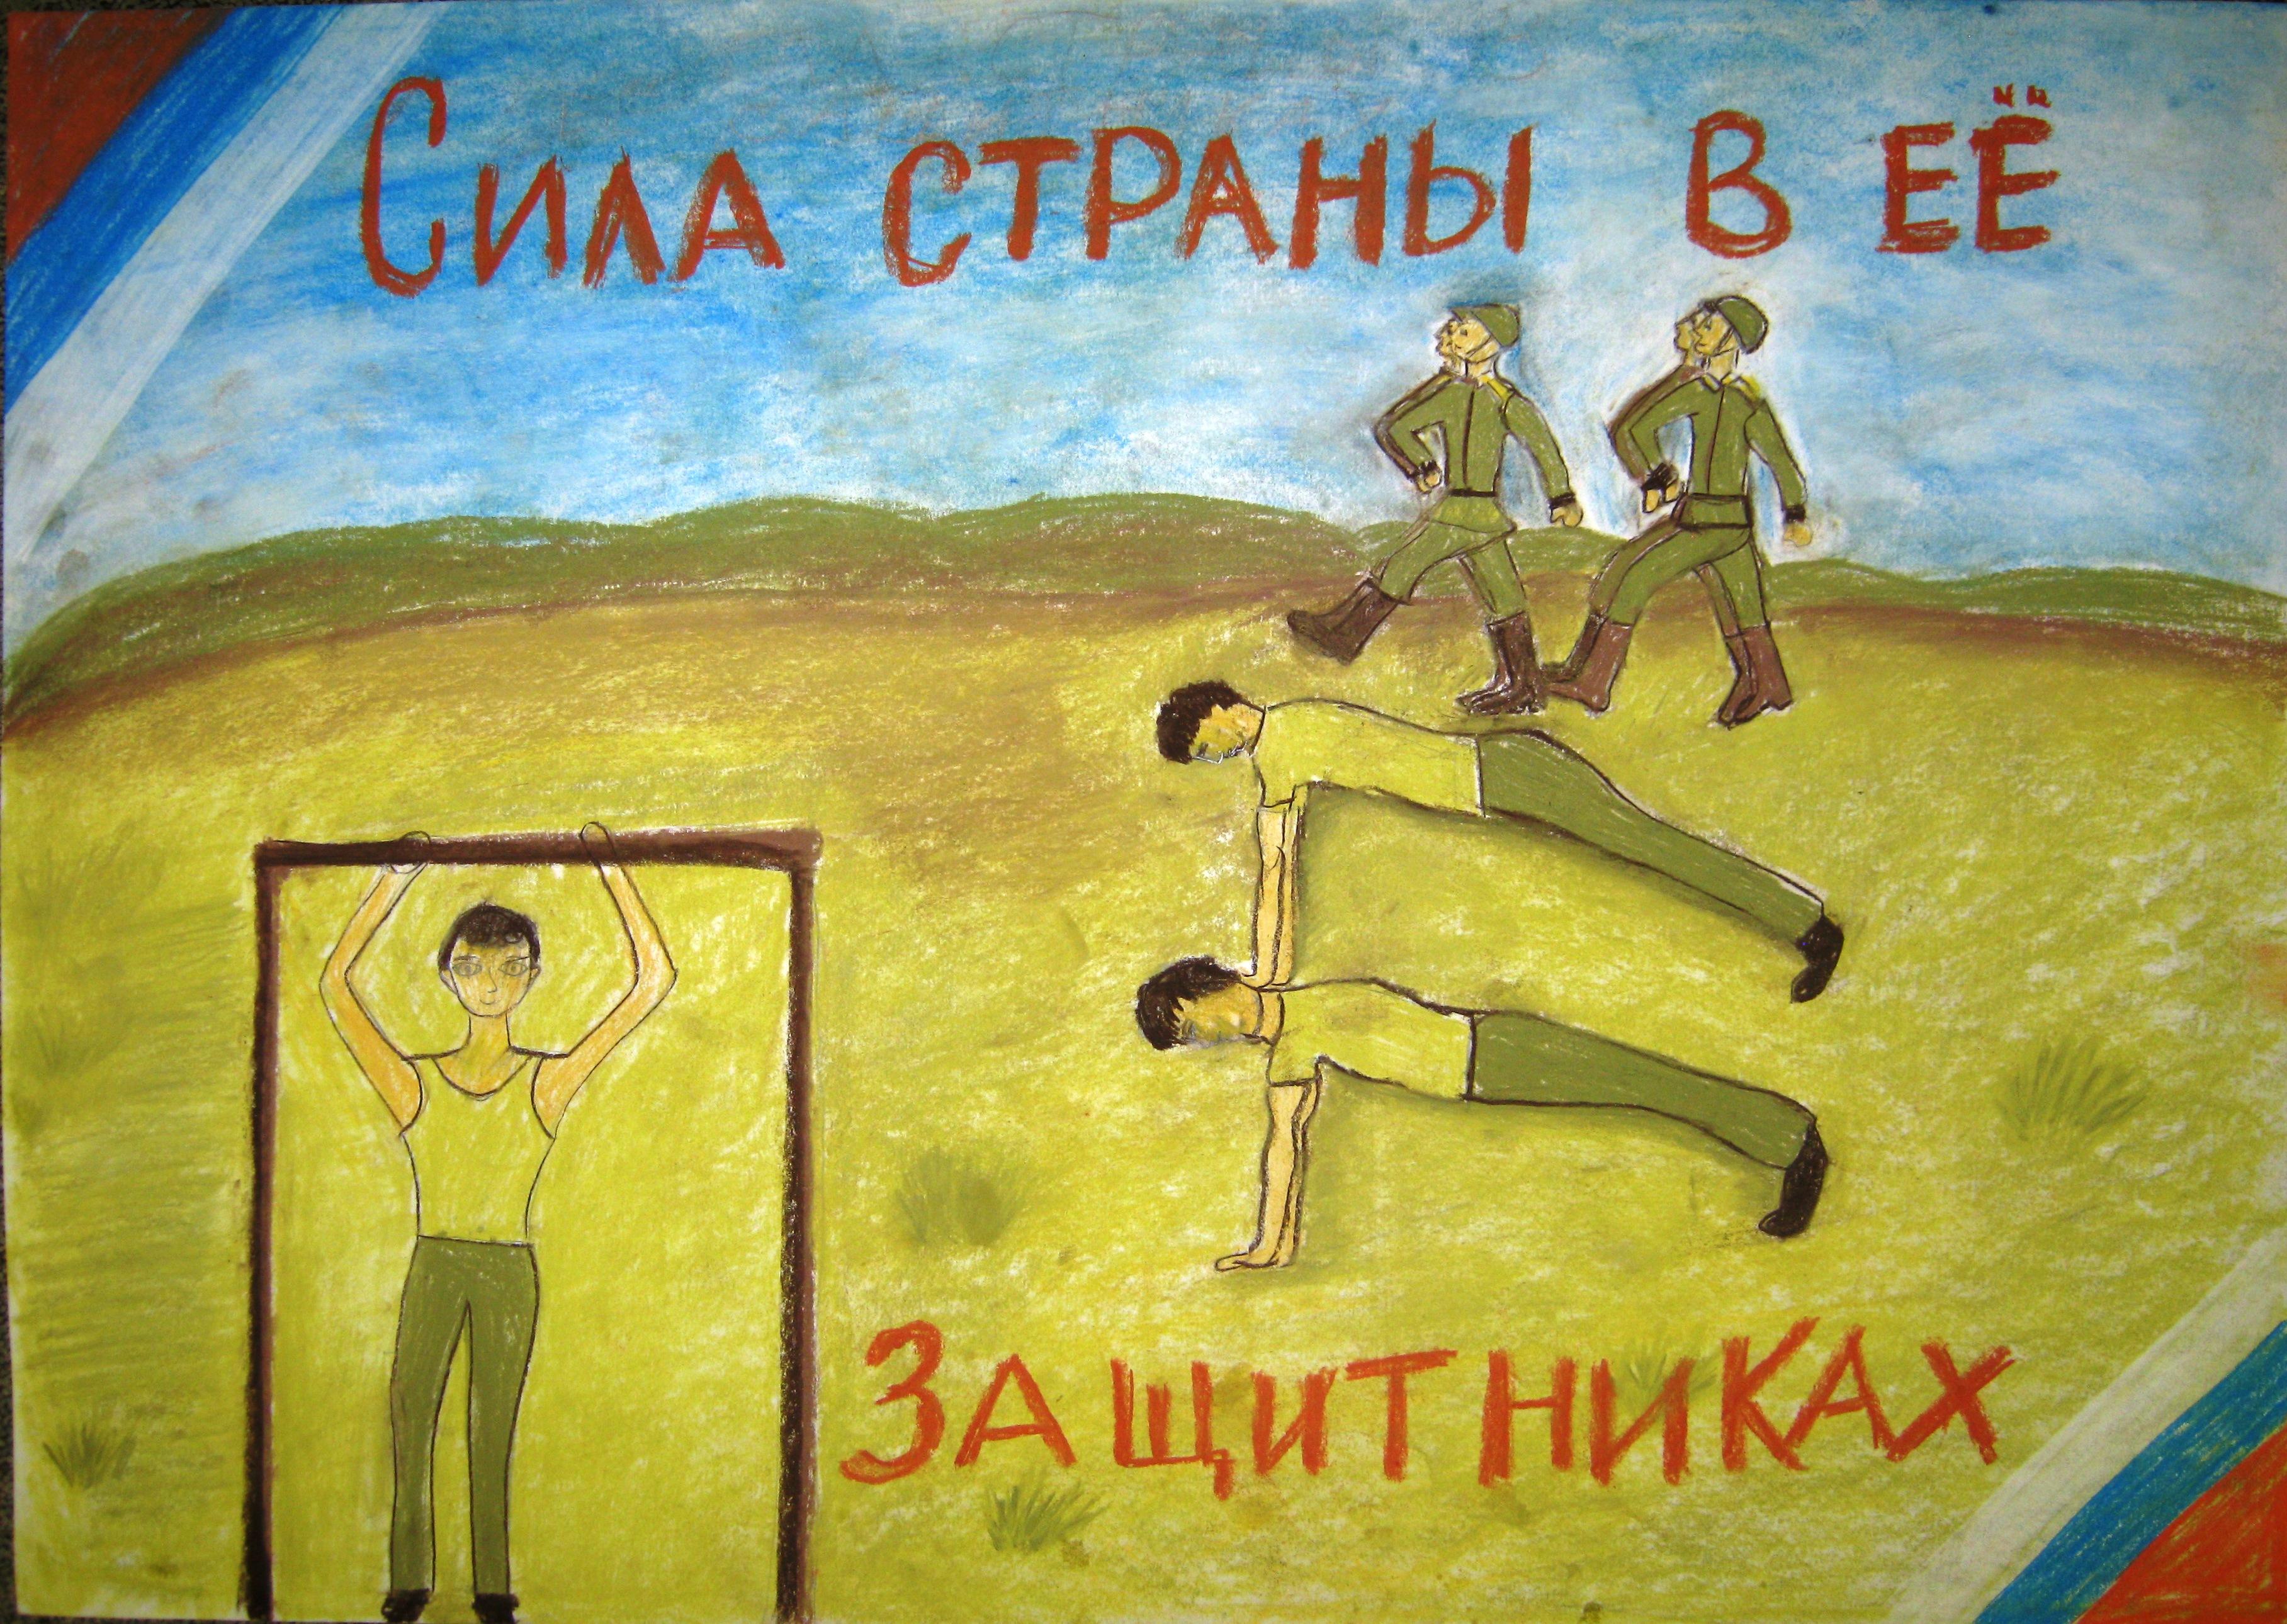 Мякишева Татьяна,9 лет,СОШ № 135